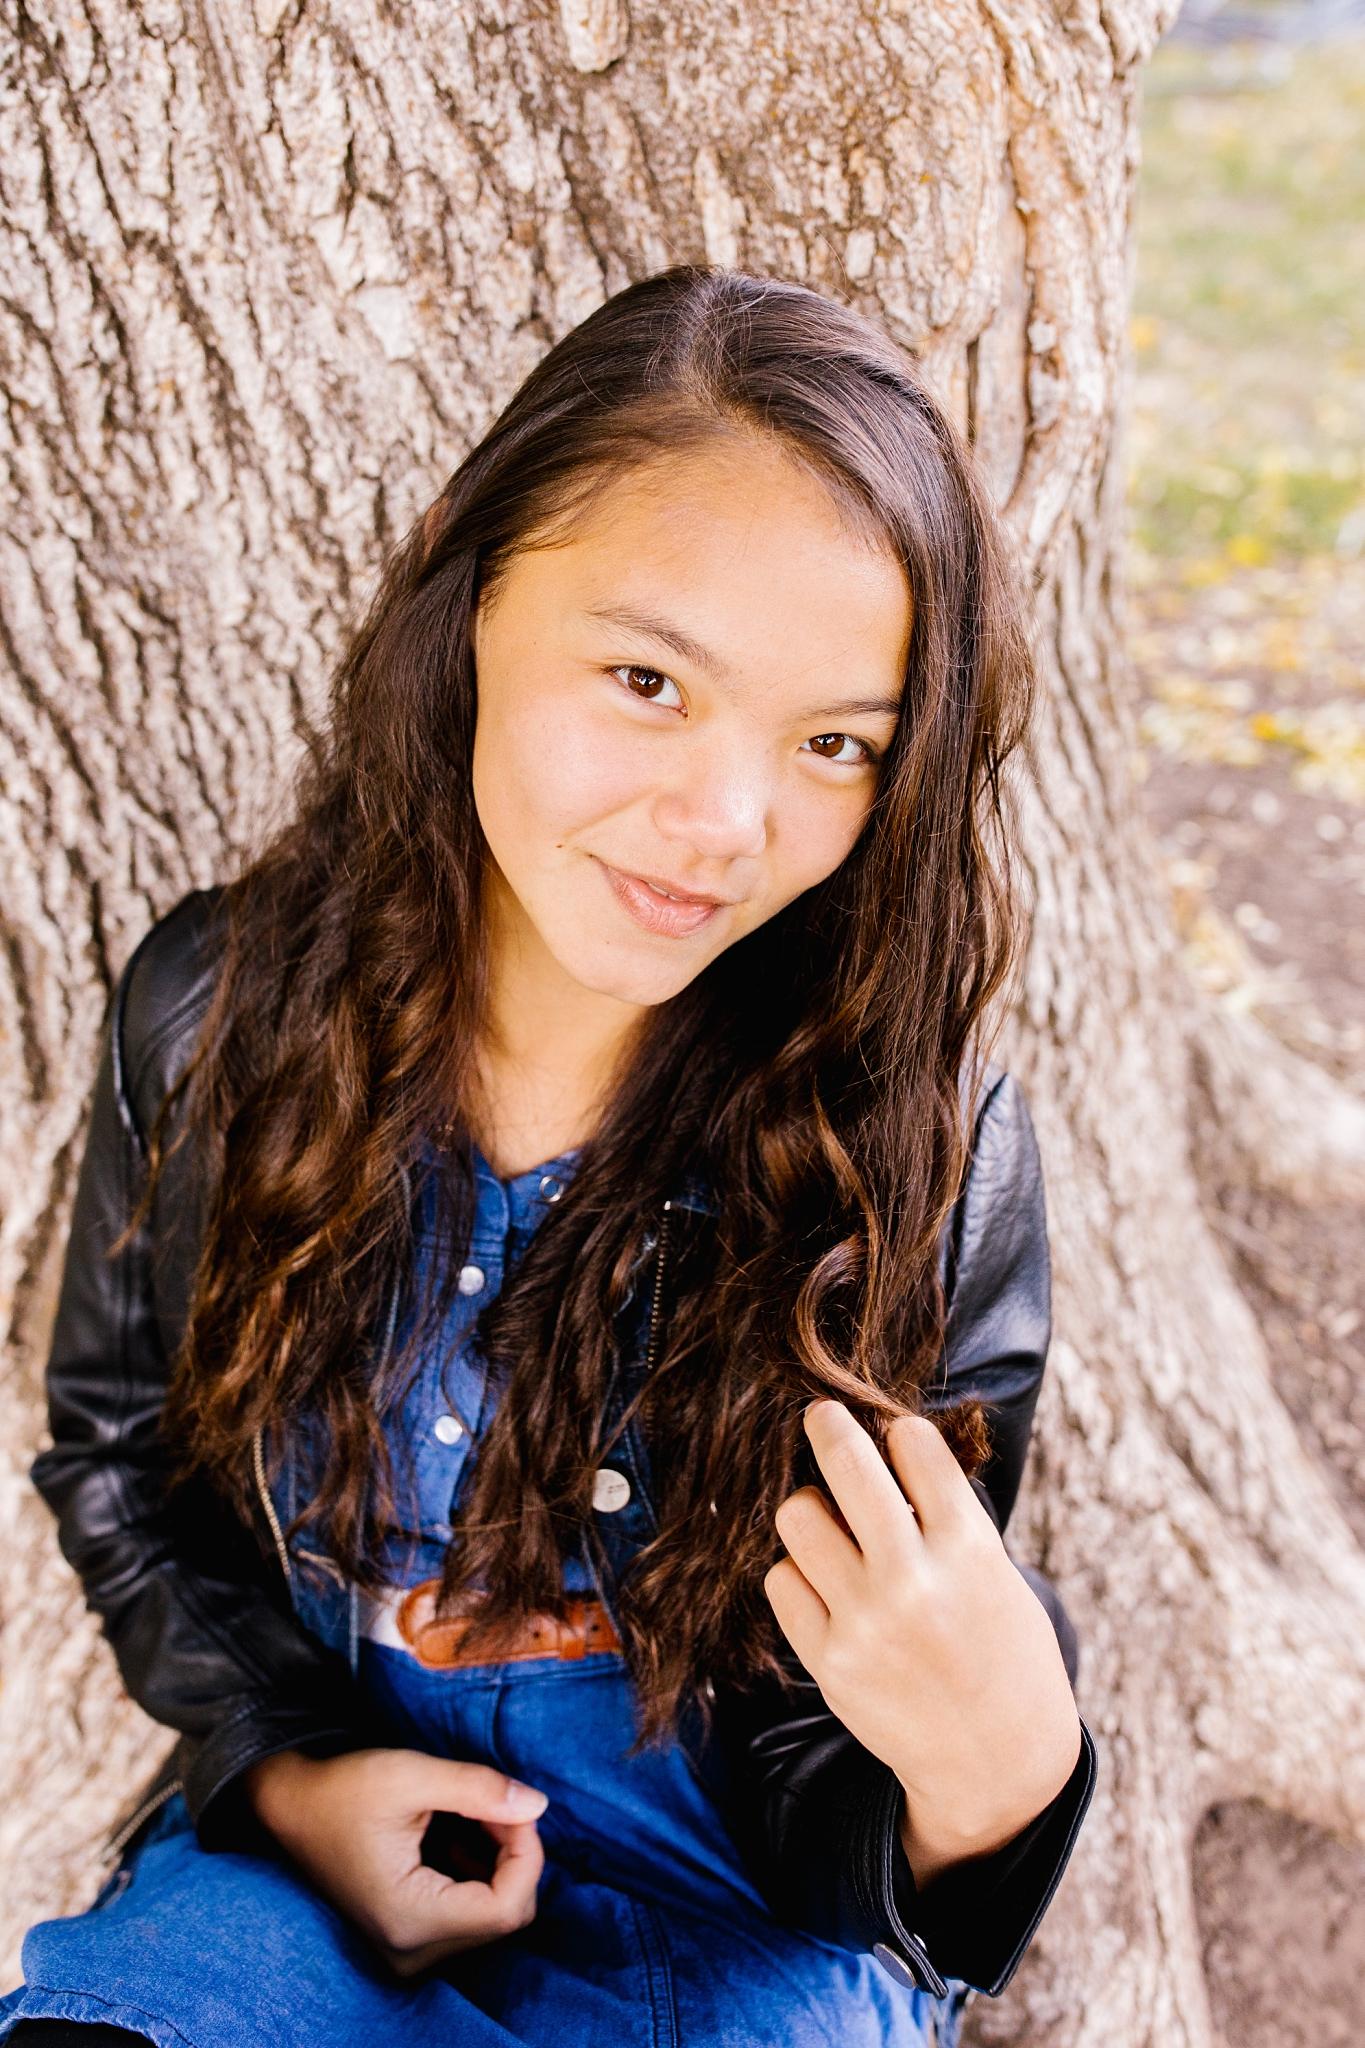 Qian-40_Lizzie-B-Imagery-Utah-Family-Photographer-Lifestyle-Photography-Salt-Lake-City-Park-City-Utah-County-Jolleys-Ranch-Hobble-Creek-Canyon-Springville-Utah.jpg